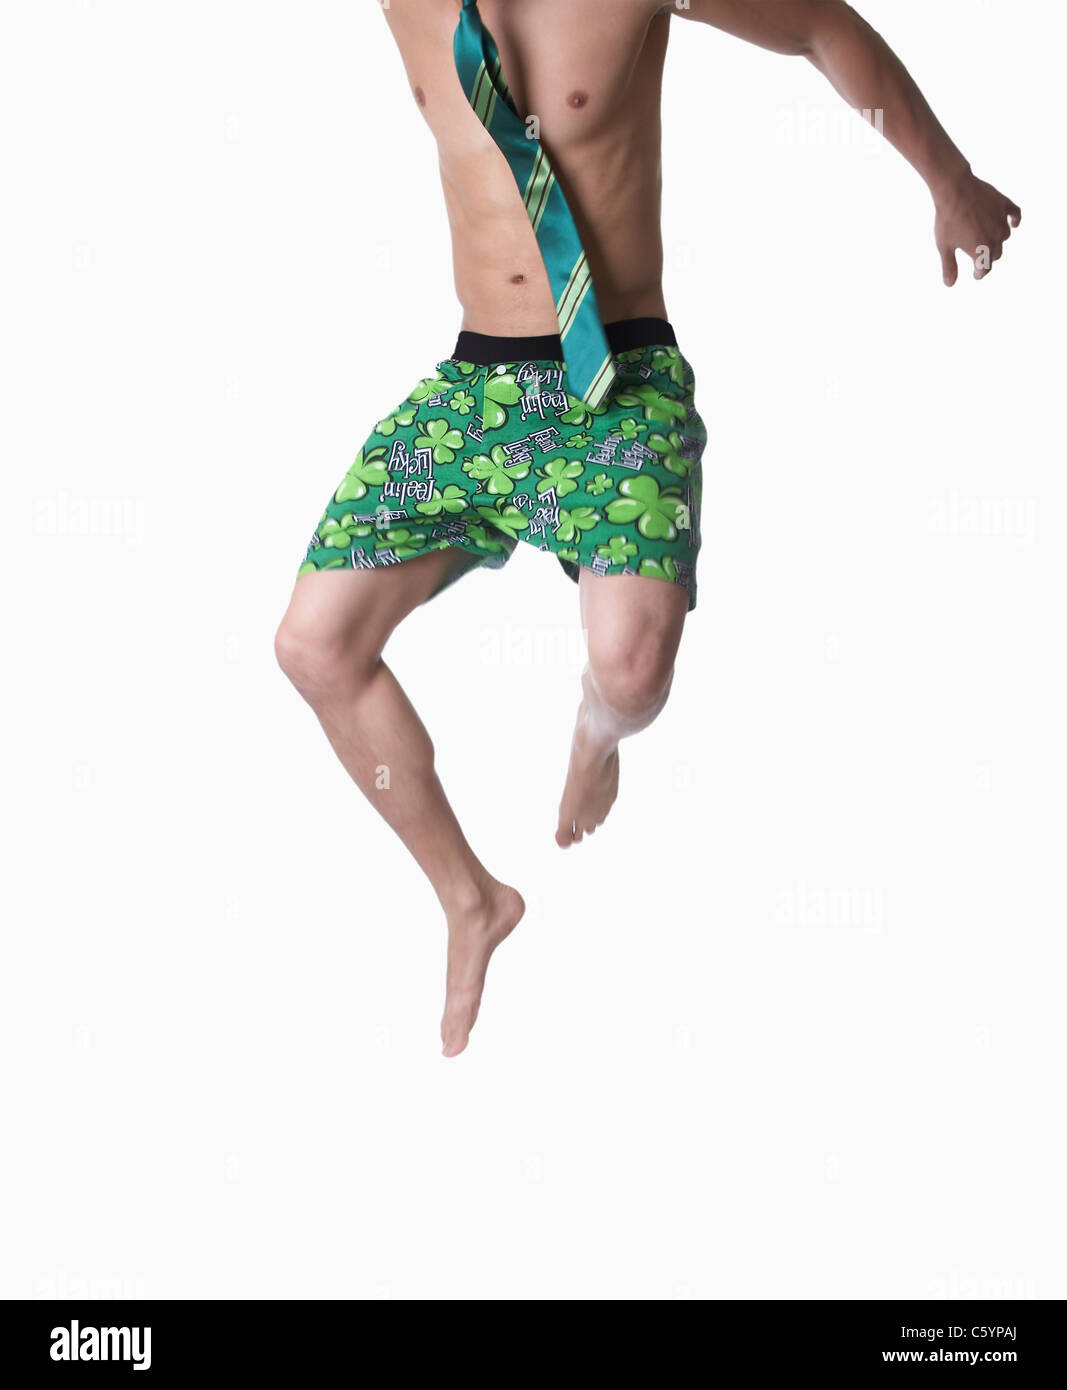 USA California, Fairfax, studio shot of young man wearing green boxer shorts with shamrocks jumping , low section - Stock Image